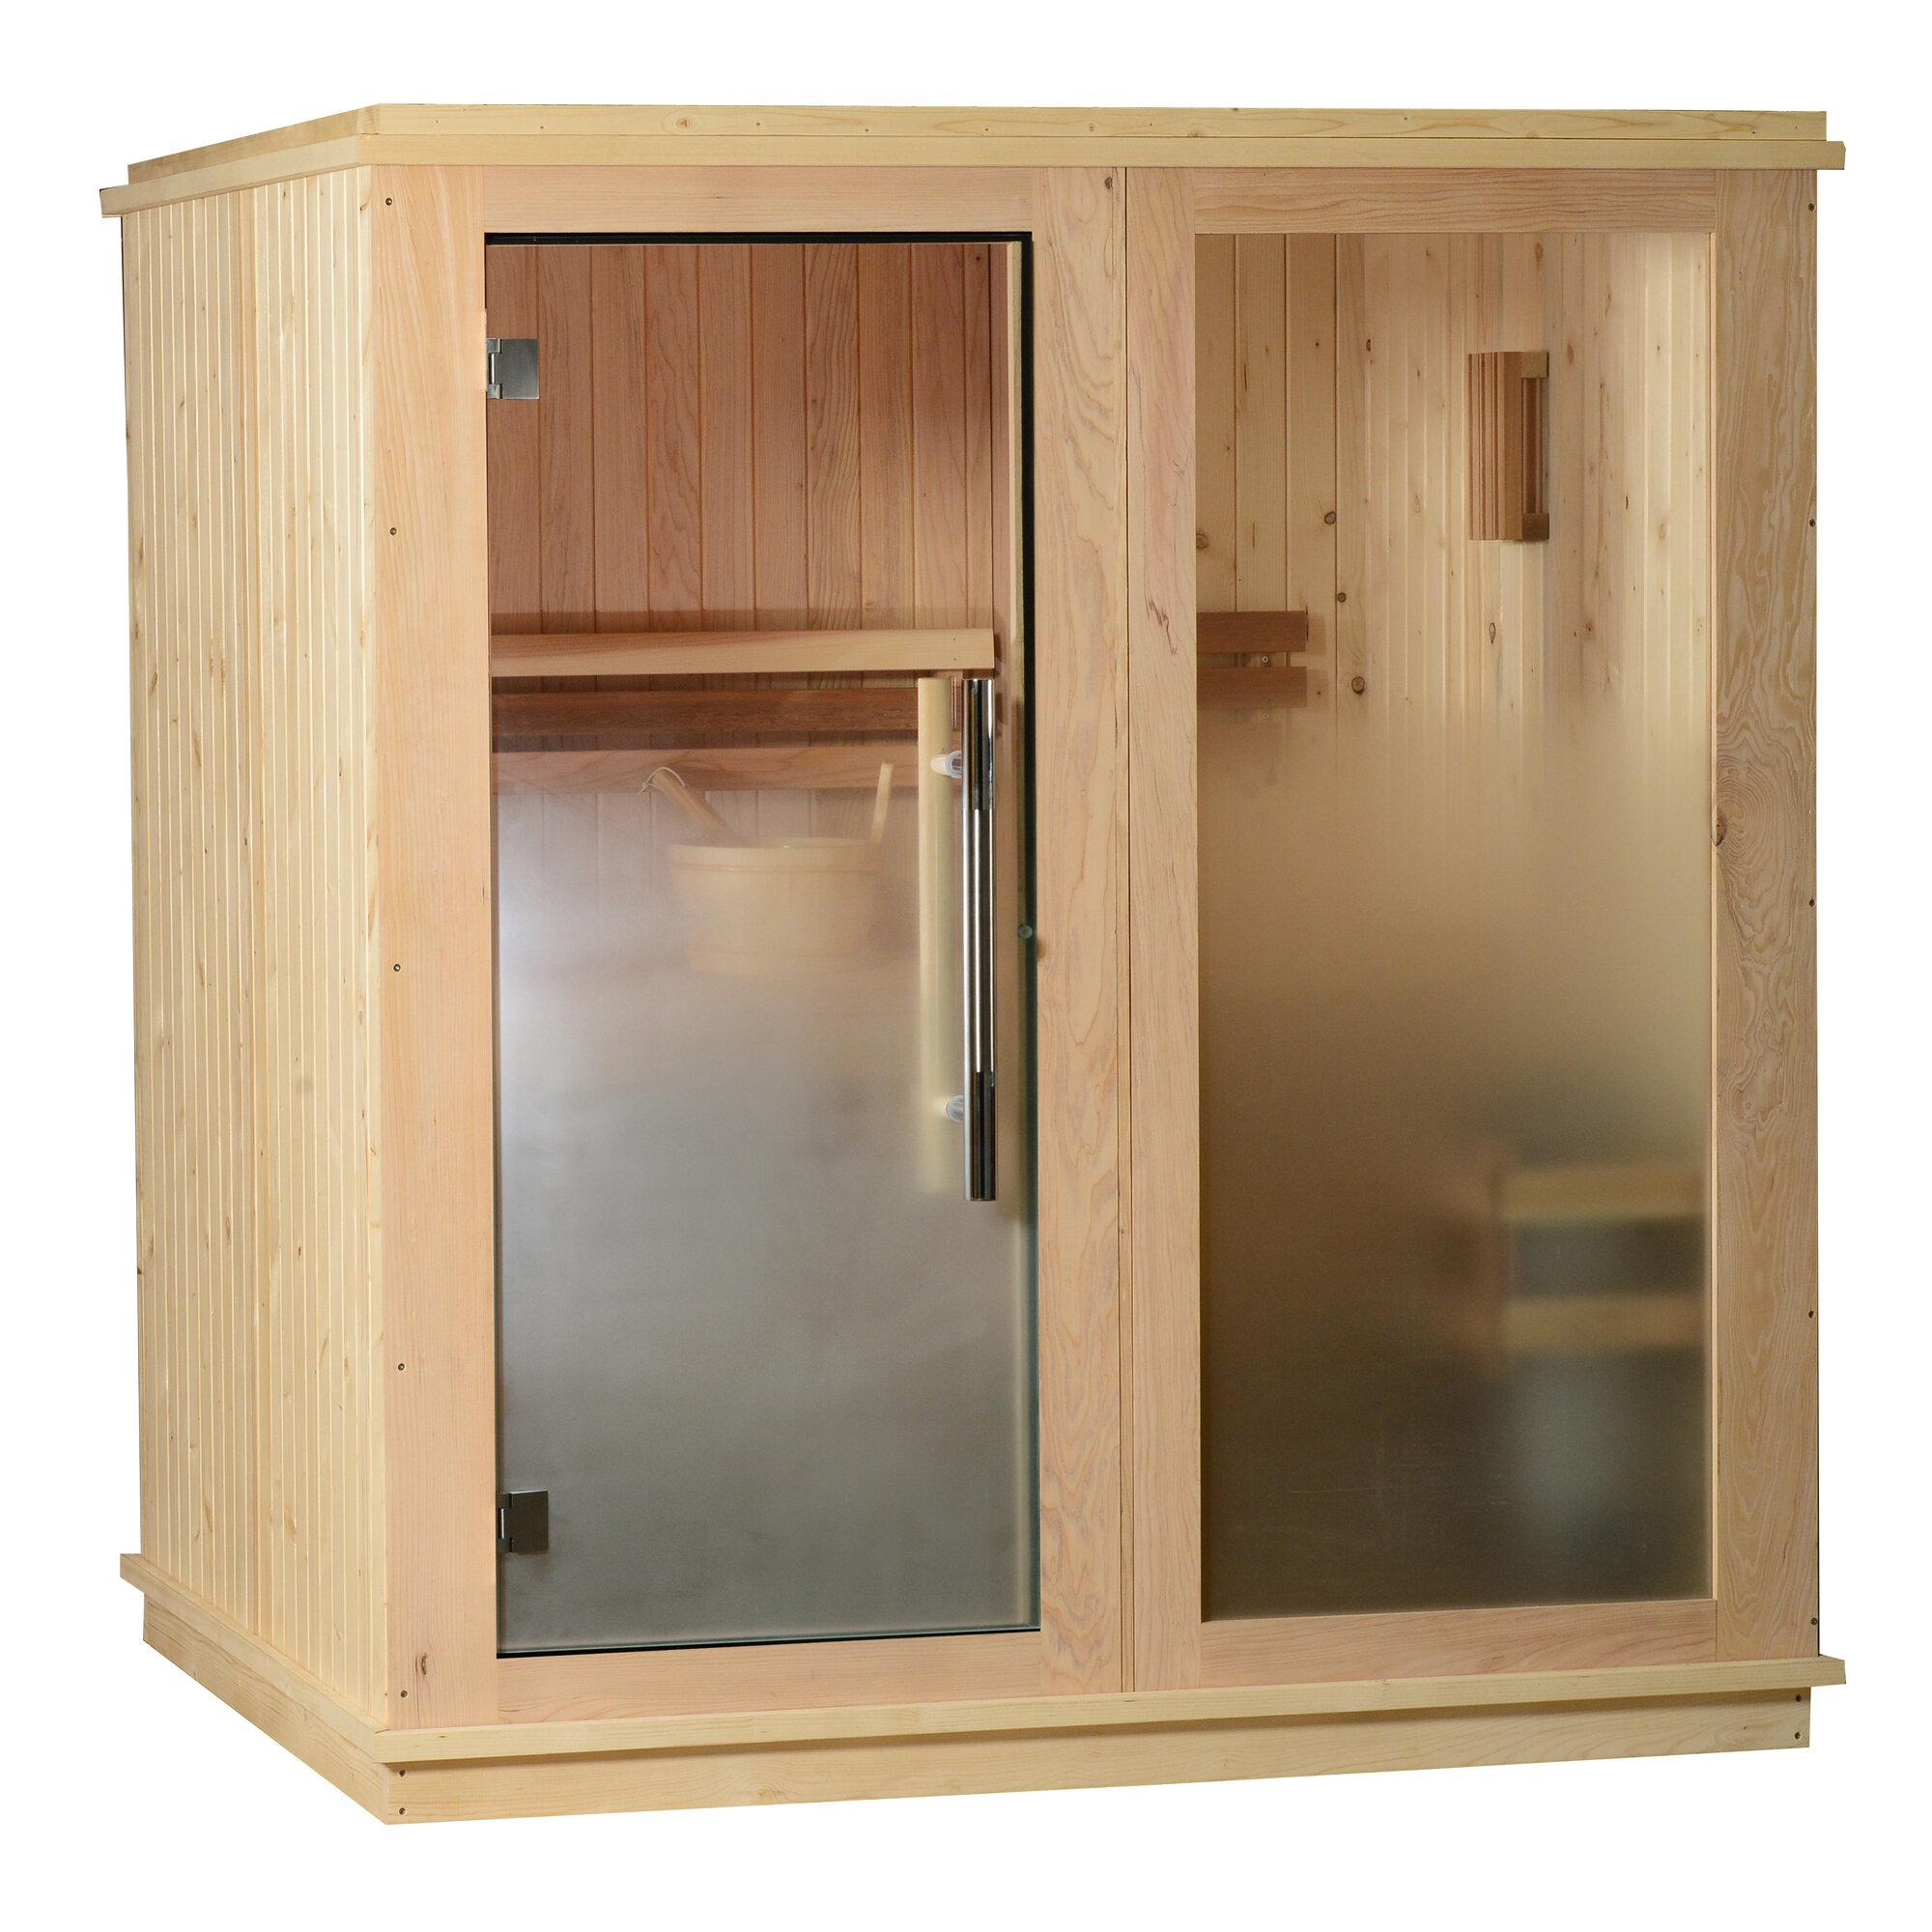 Sauna Building Plans Wiring Harness Wiring Diagram Wiring